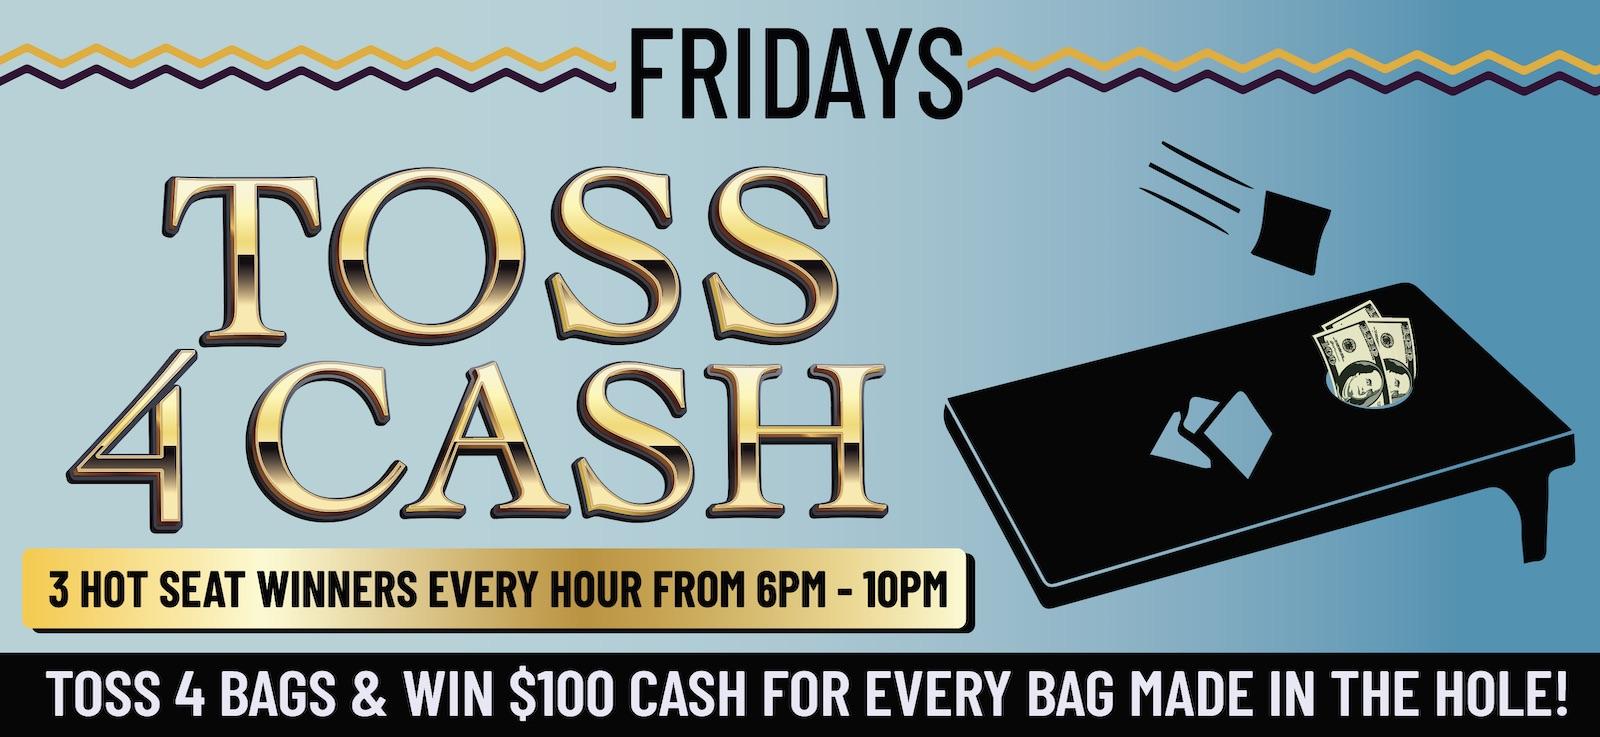 wanaaha casino toss 4 cash